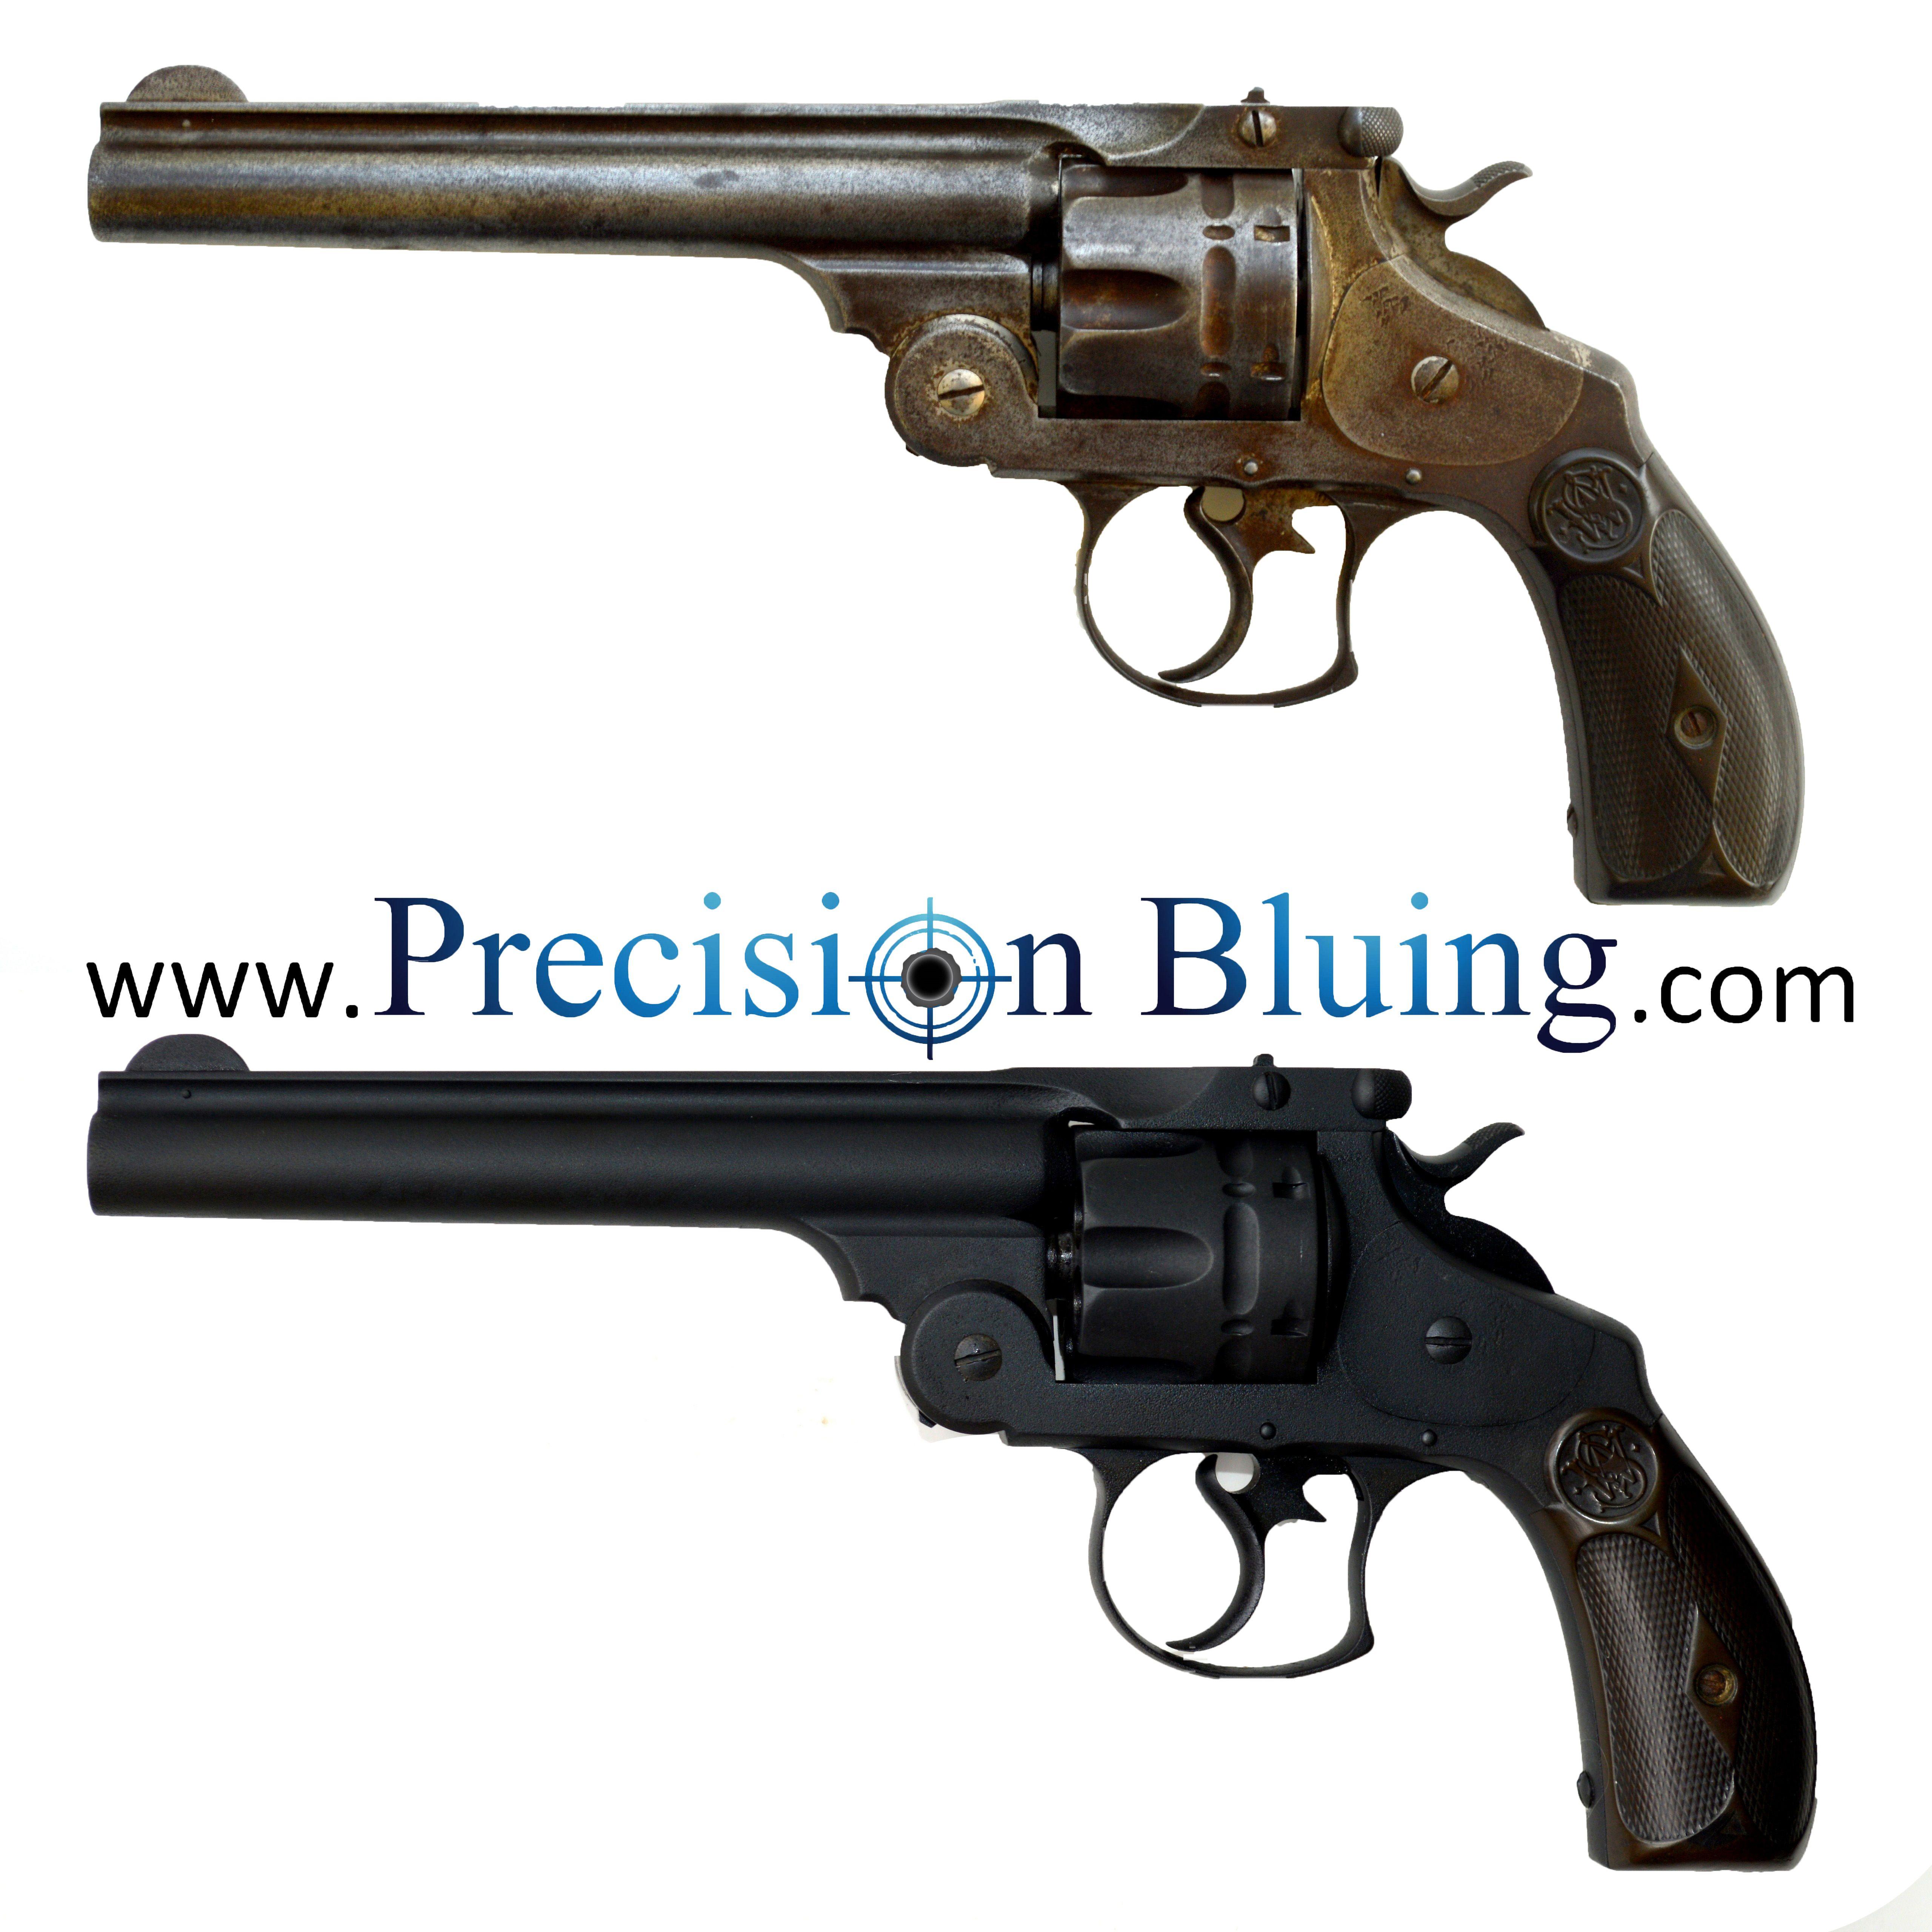 Creedmoor, NC Hand guns, Smith wesson, Will smith